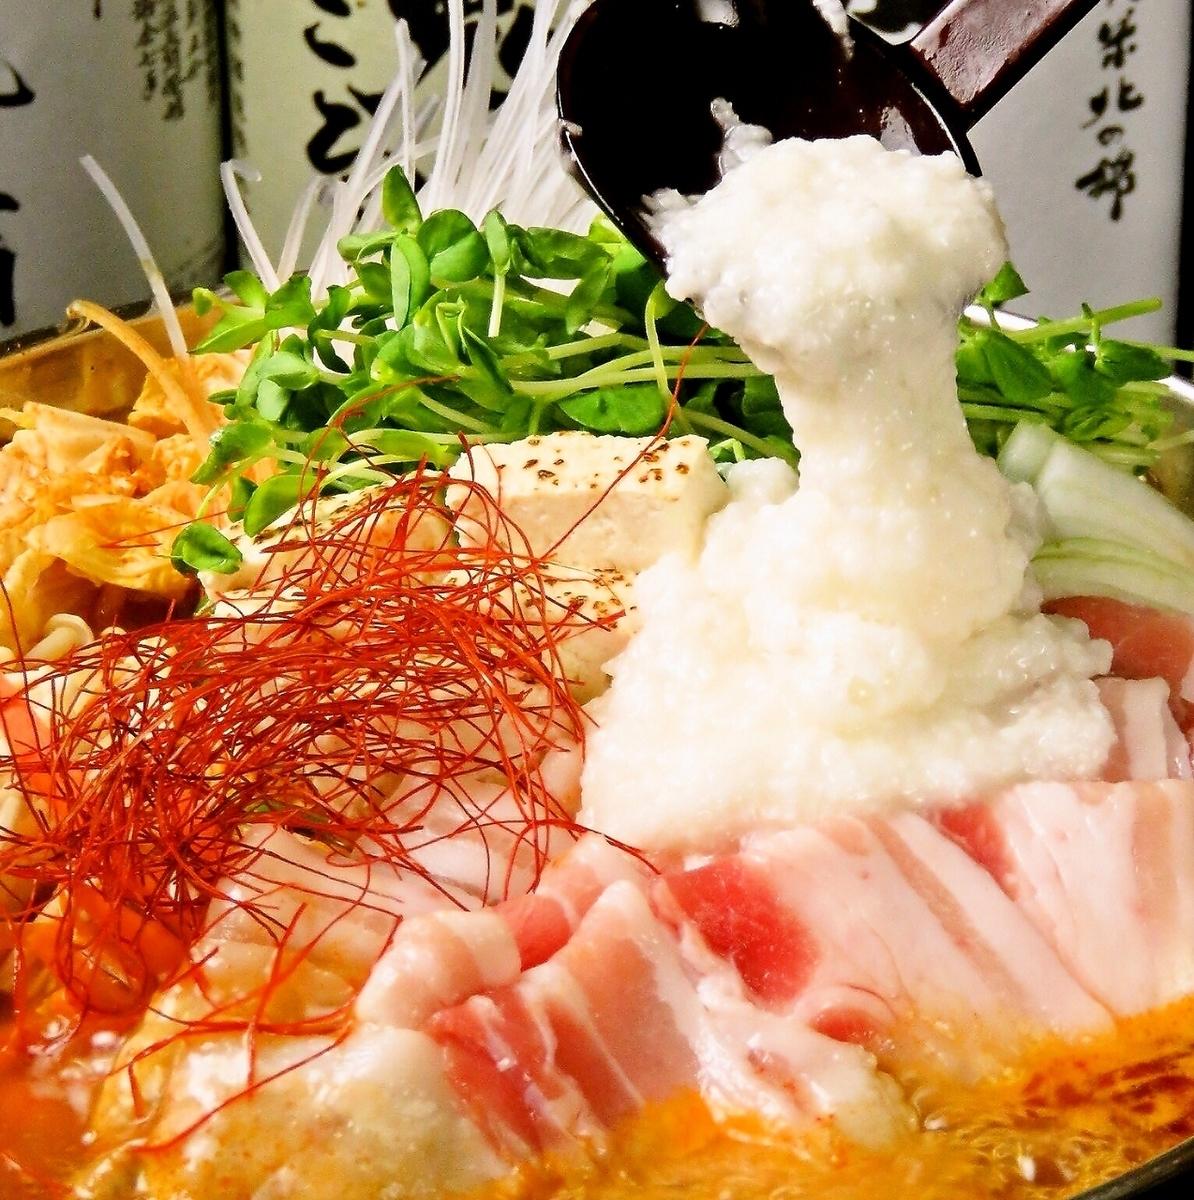 Pork troll pot (soy sauce taste or chicken taste)